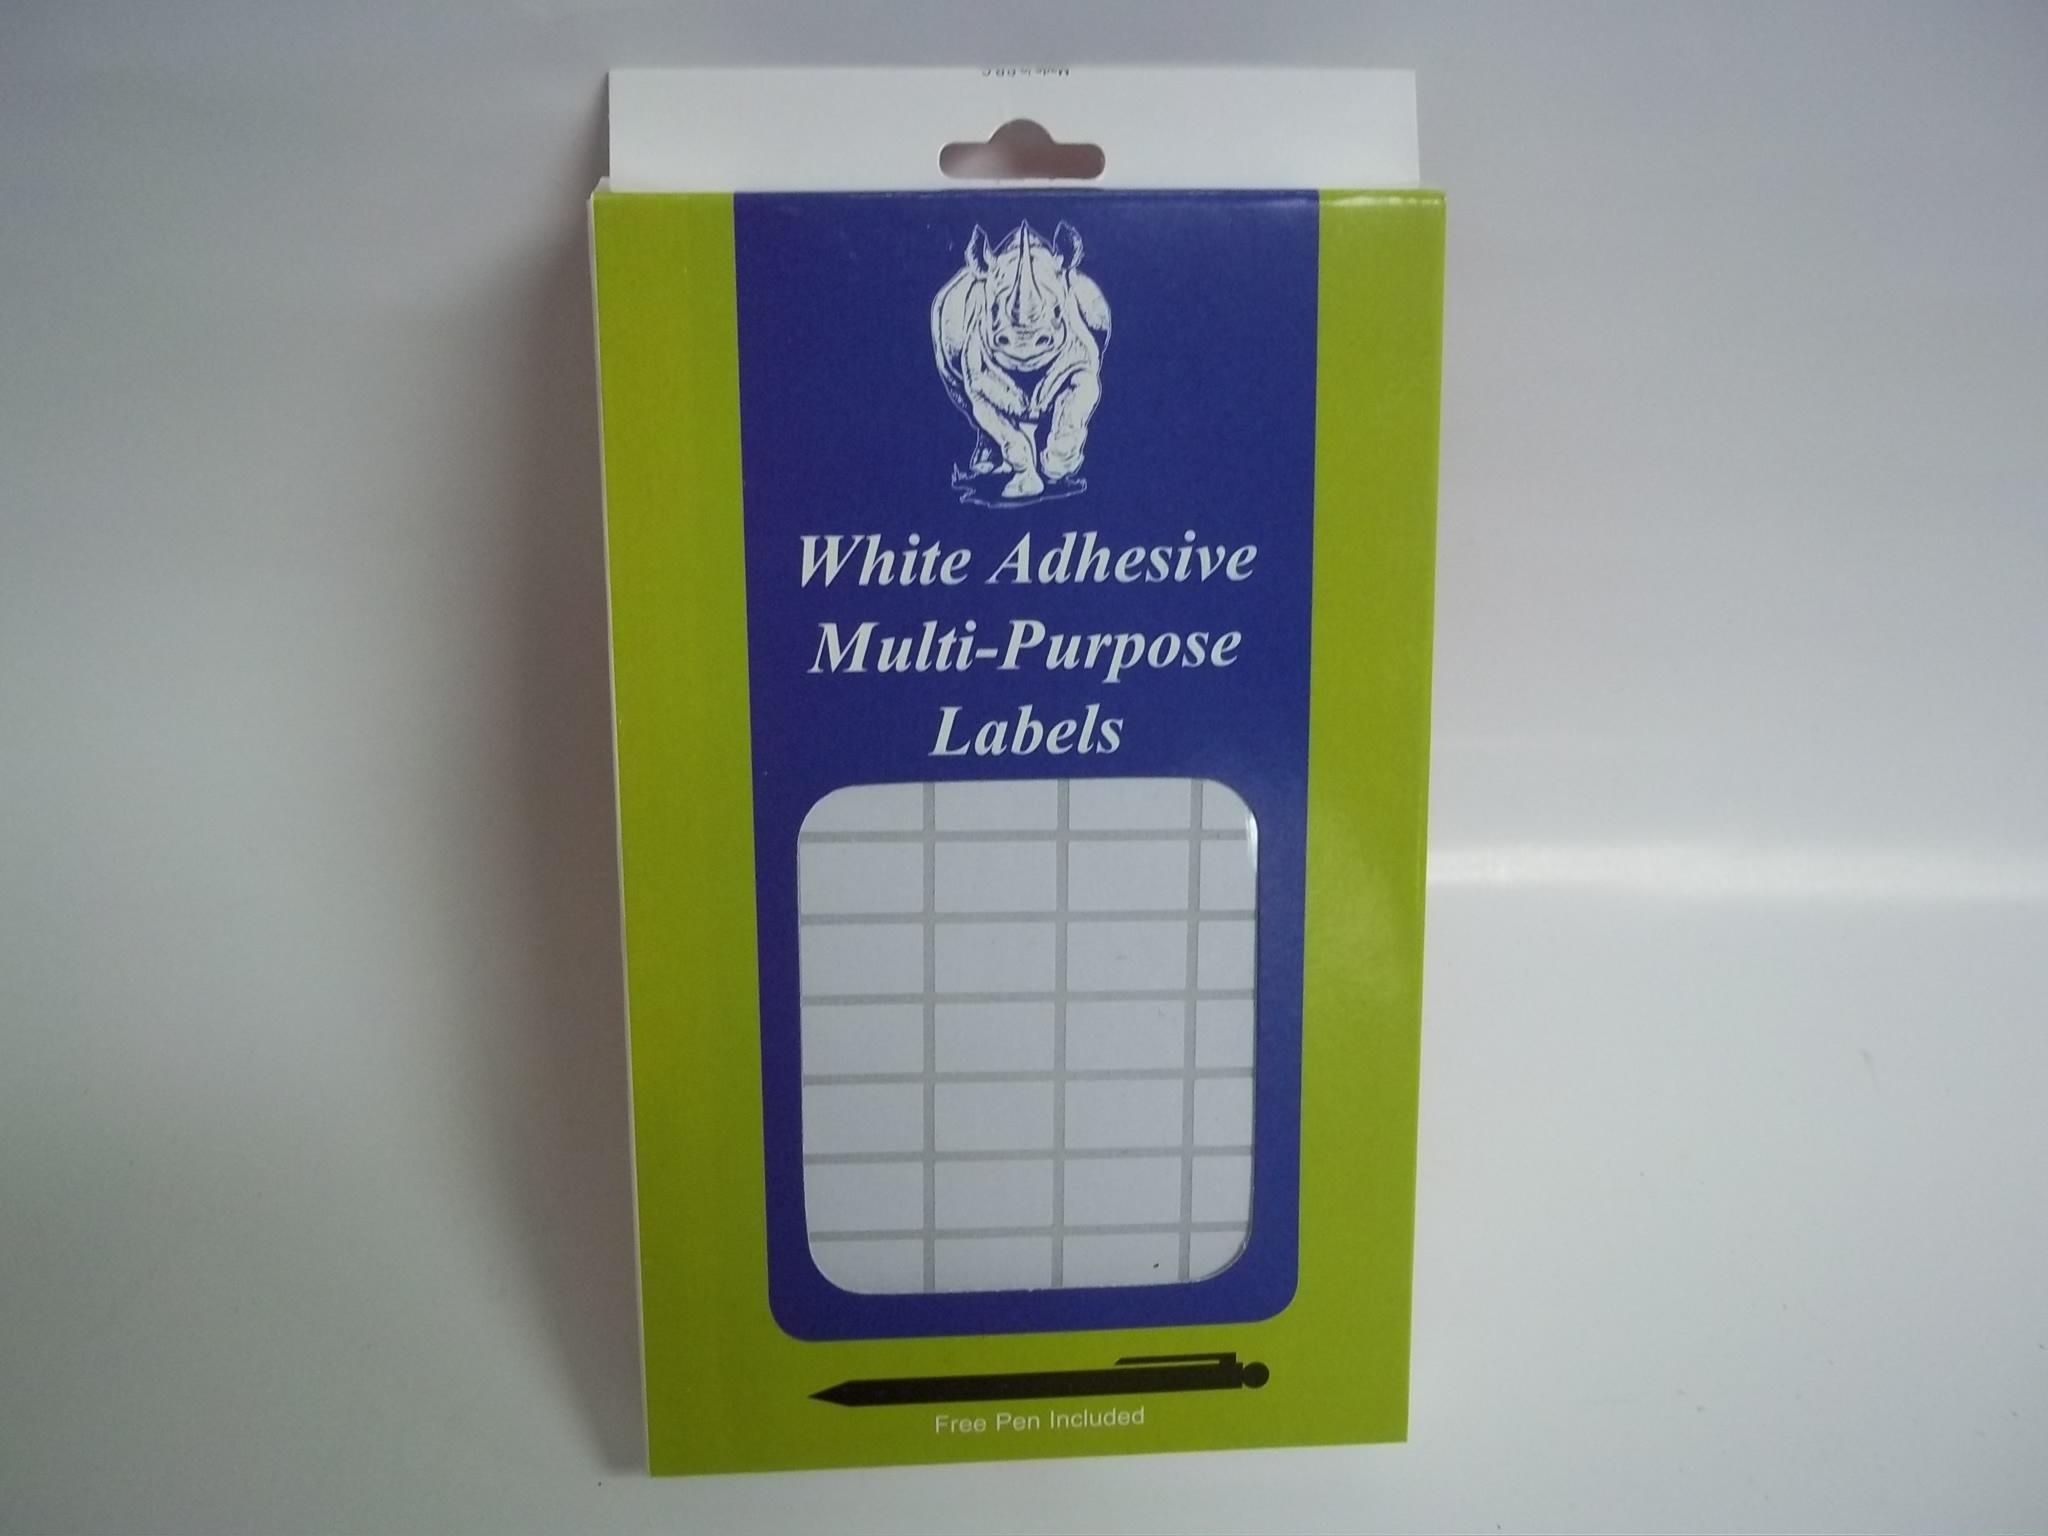 MT610S White Adhesive Multi-Purpose Labels